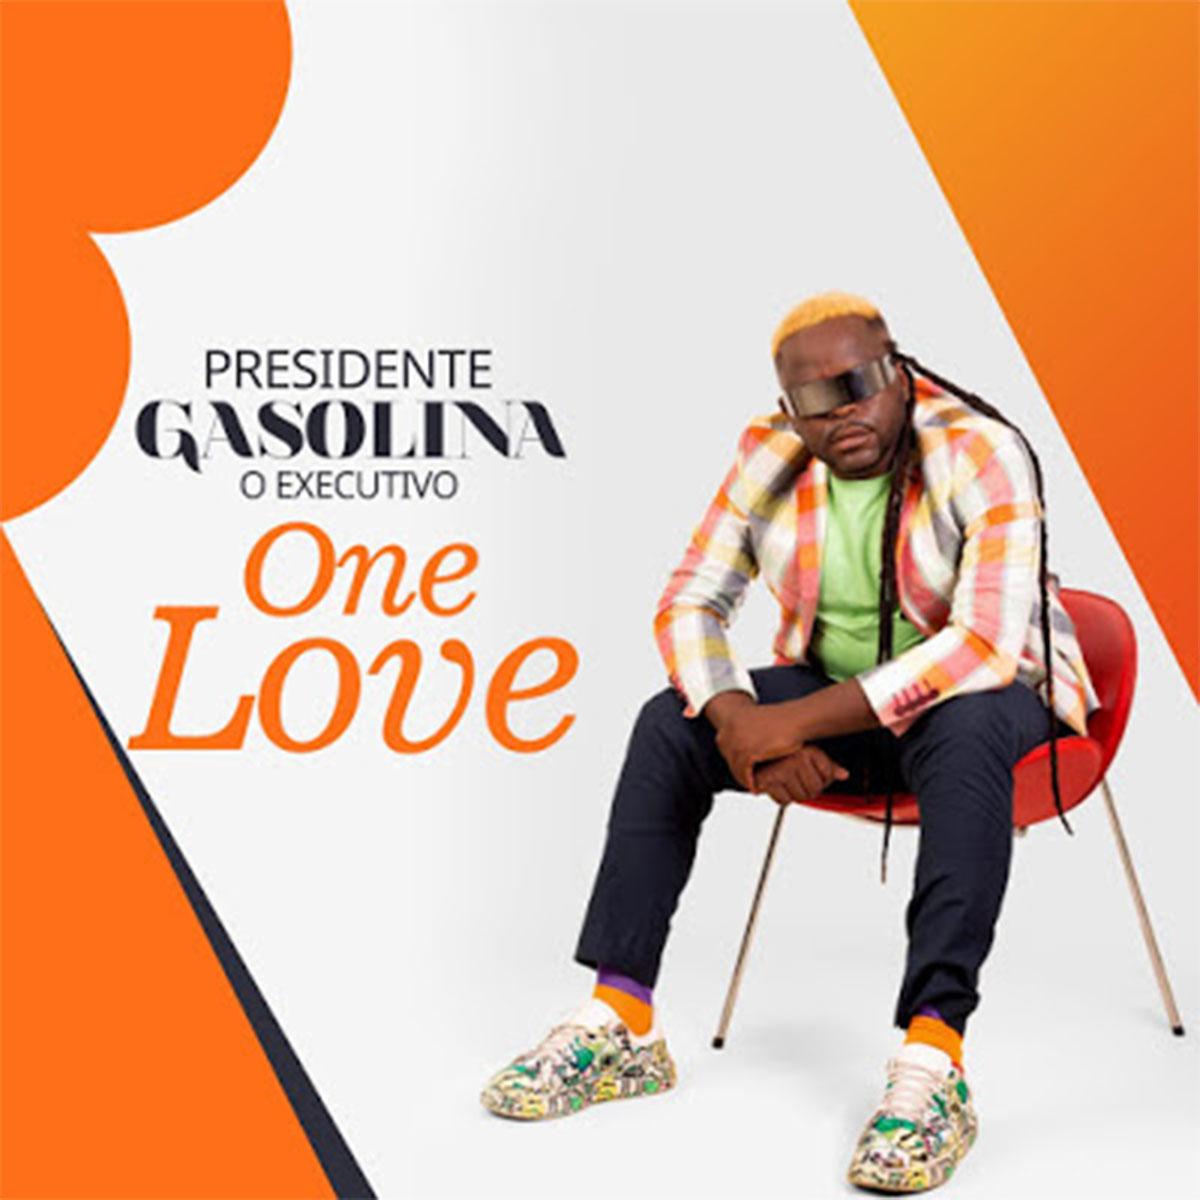 Presidente Gasolina - One Love